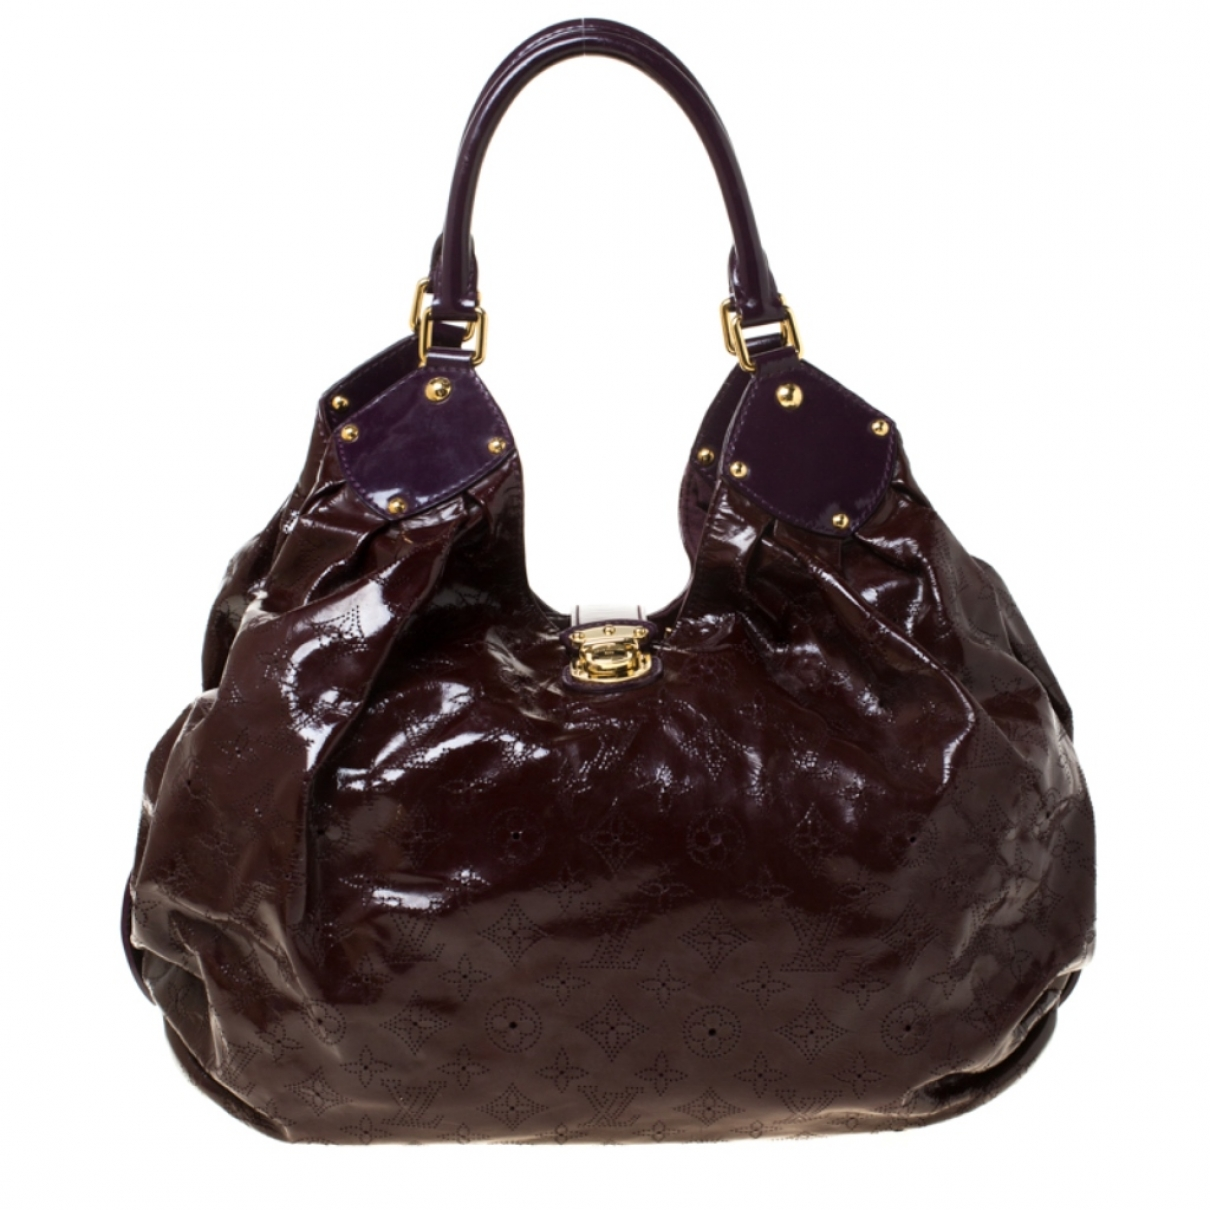 Louis Vuitton Mahina Handtasche in  Bordeauxrot Lackleder